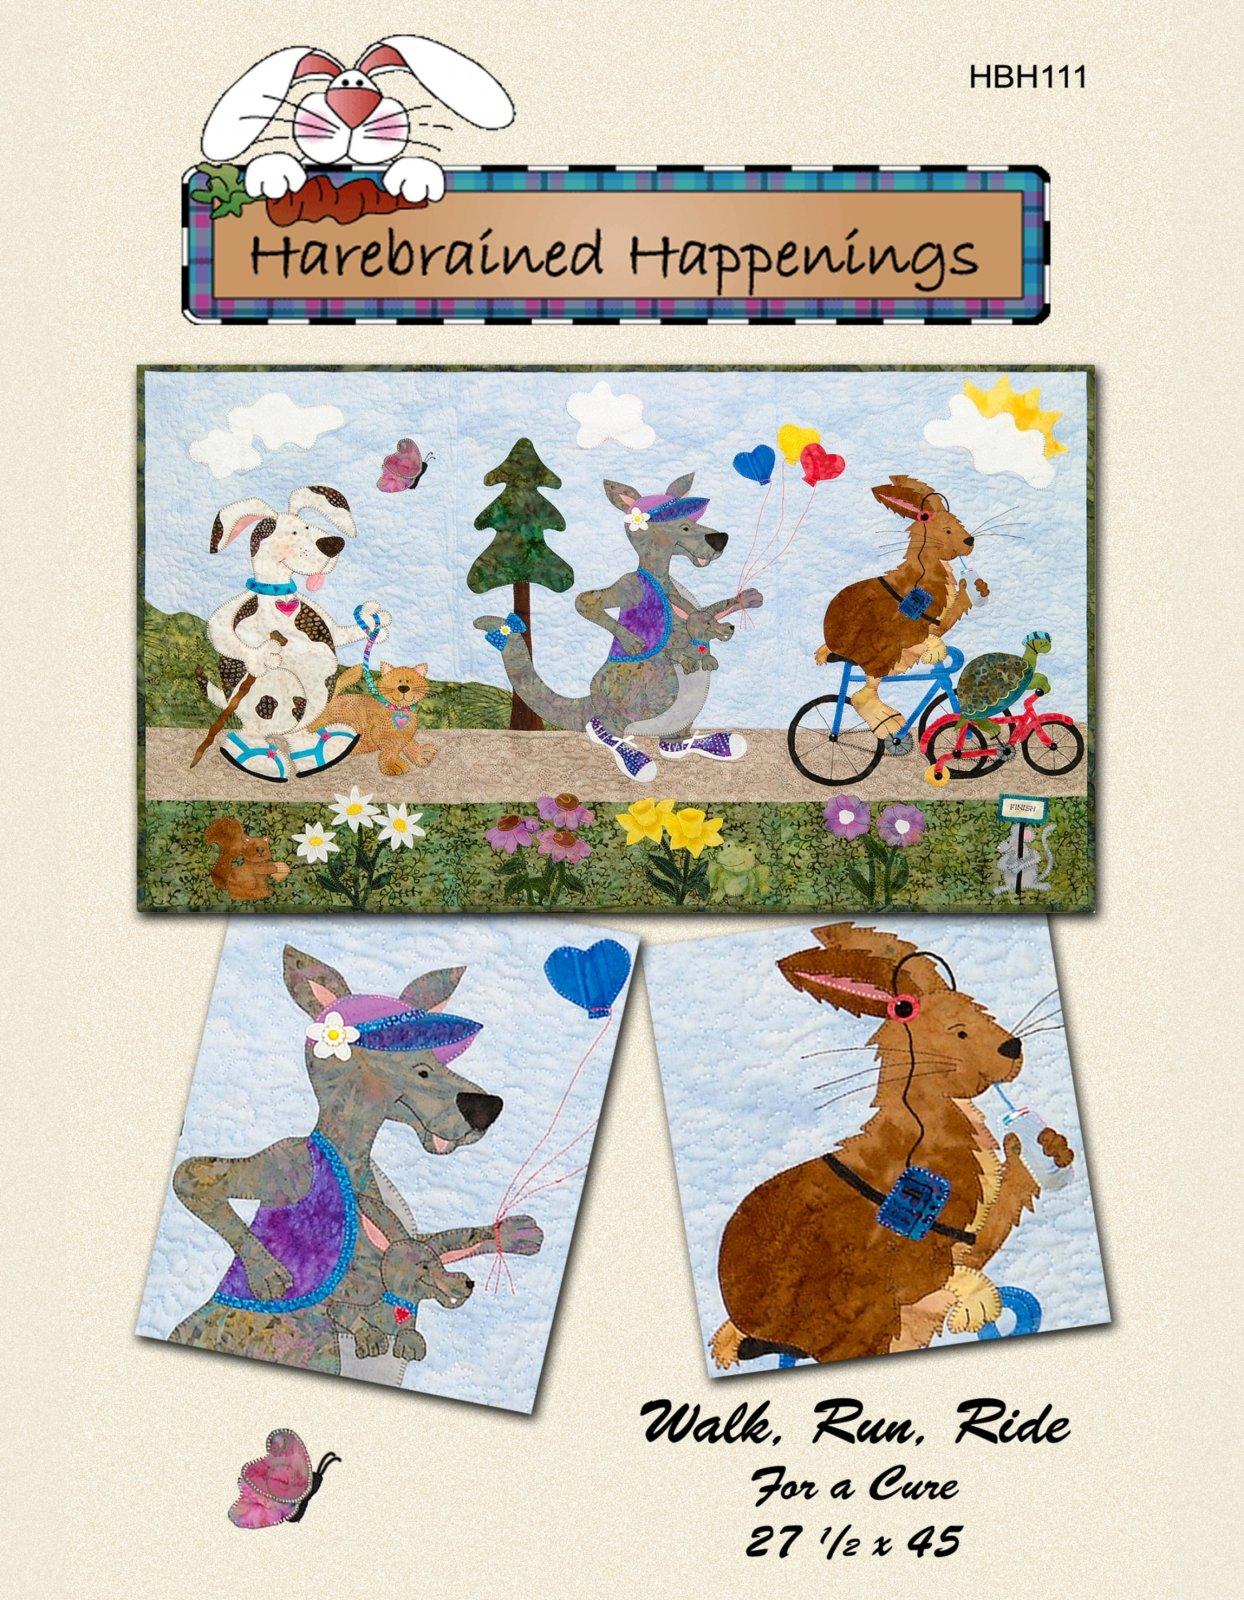 HBH111 Walk, Run, Ride for a Cure